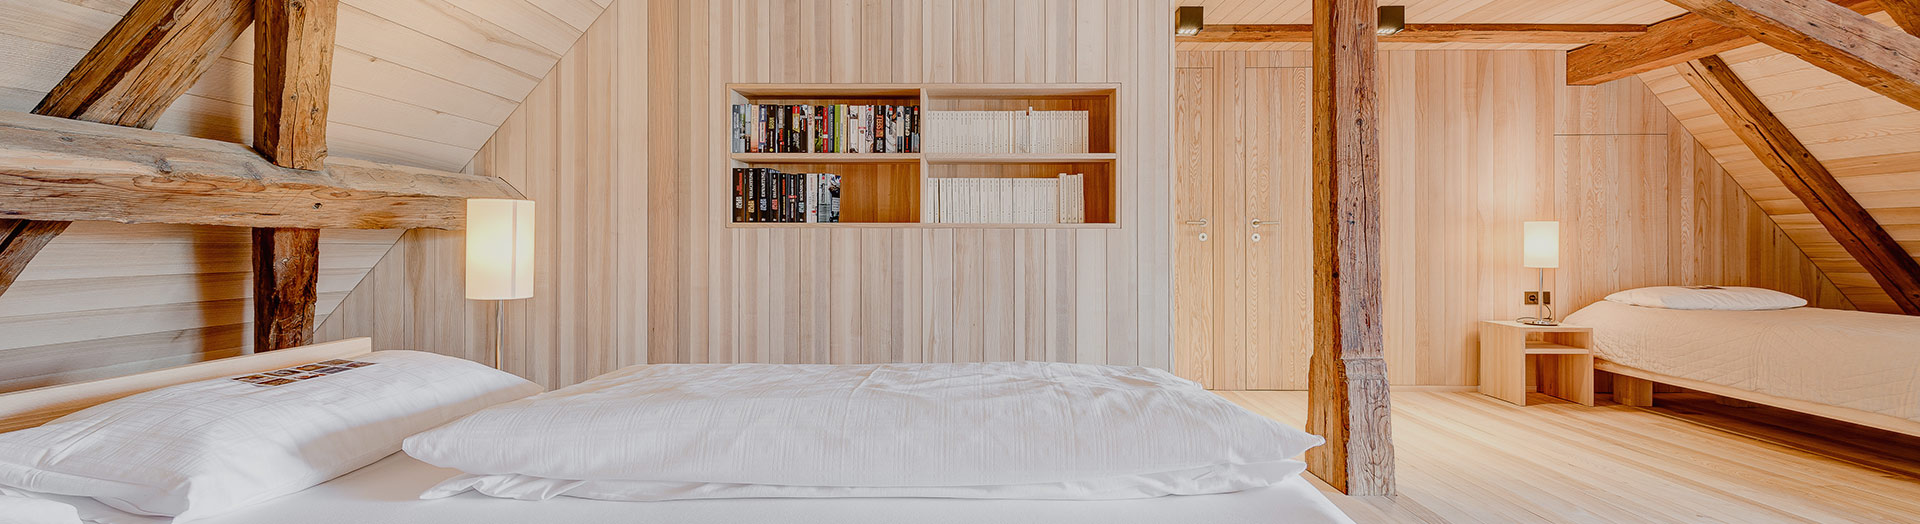 Komfortzimmer Herberge